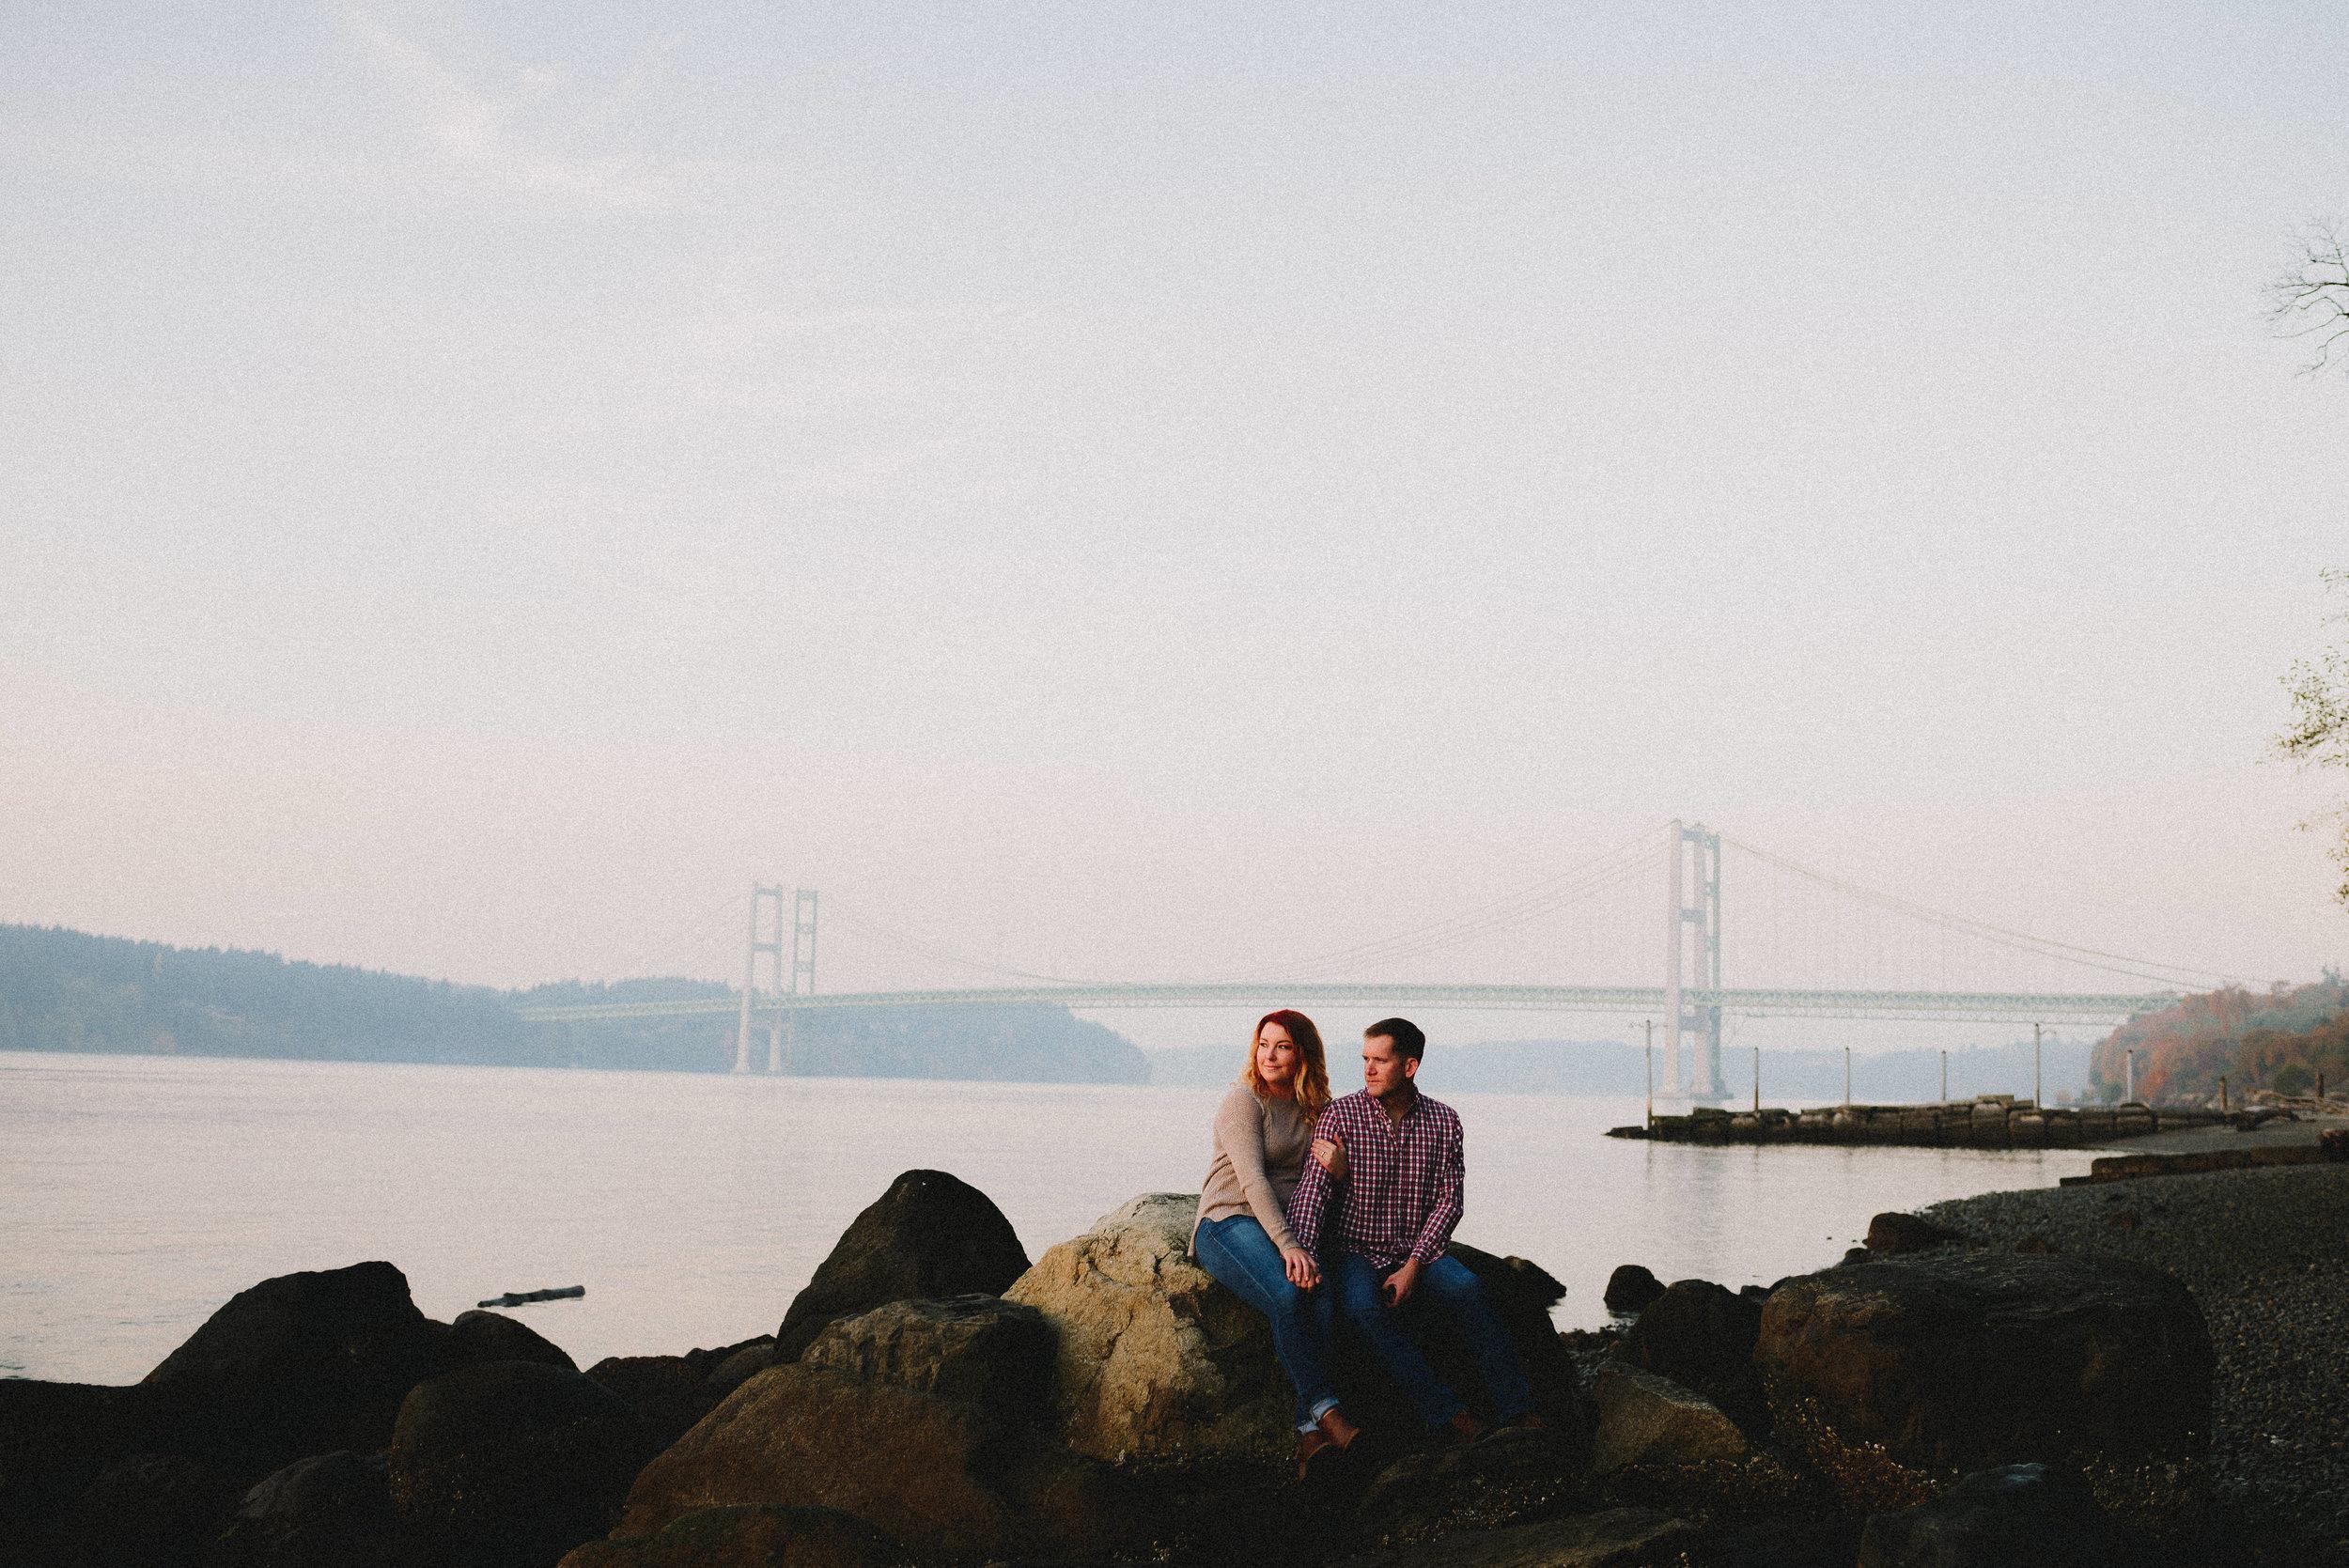 anchorage-alaska-photographer (15).jpg